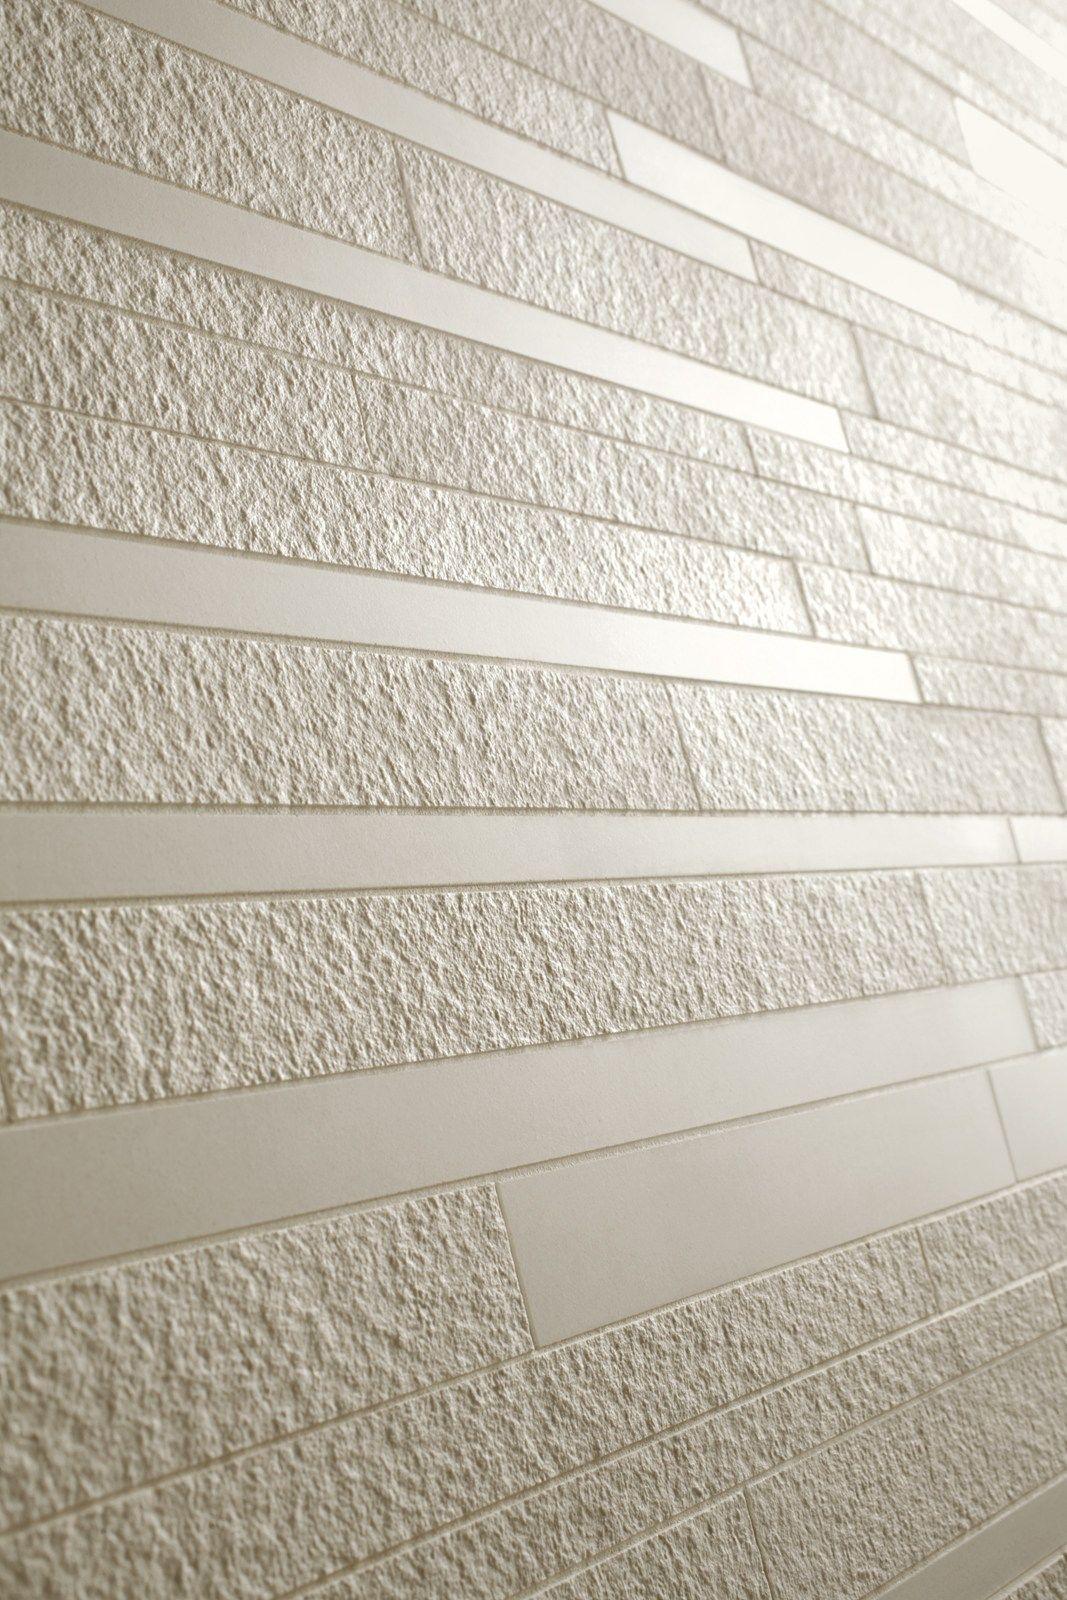 SISTEM B - Floor tiles from Marazzi Group Architonic